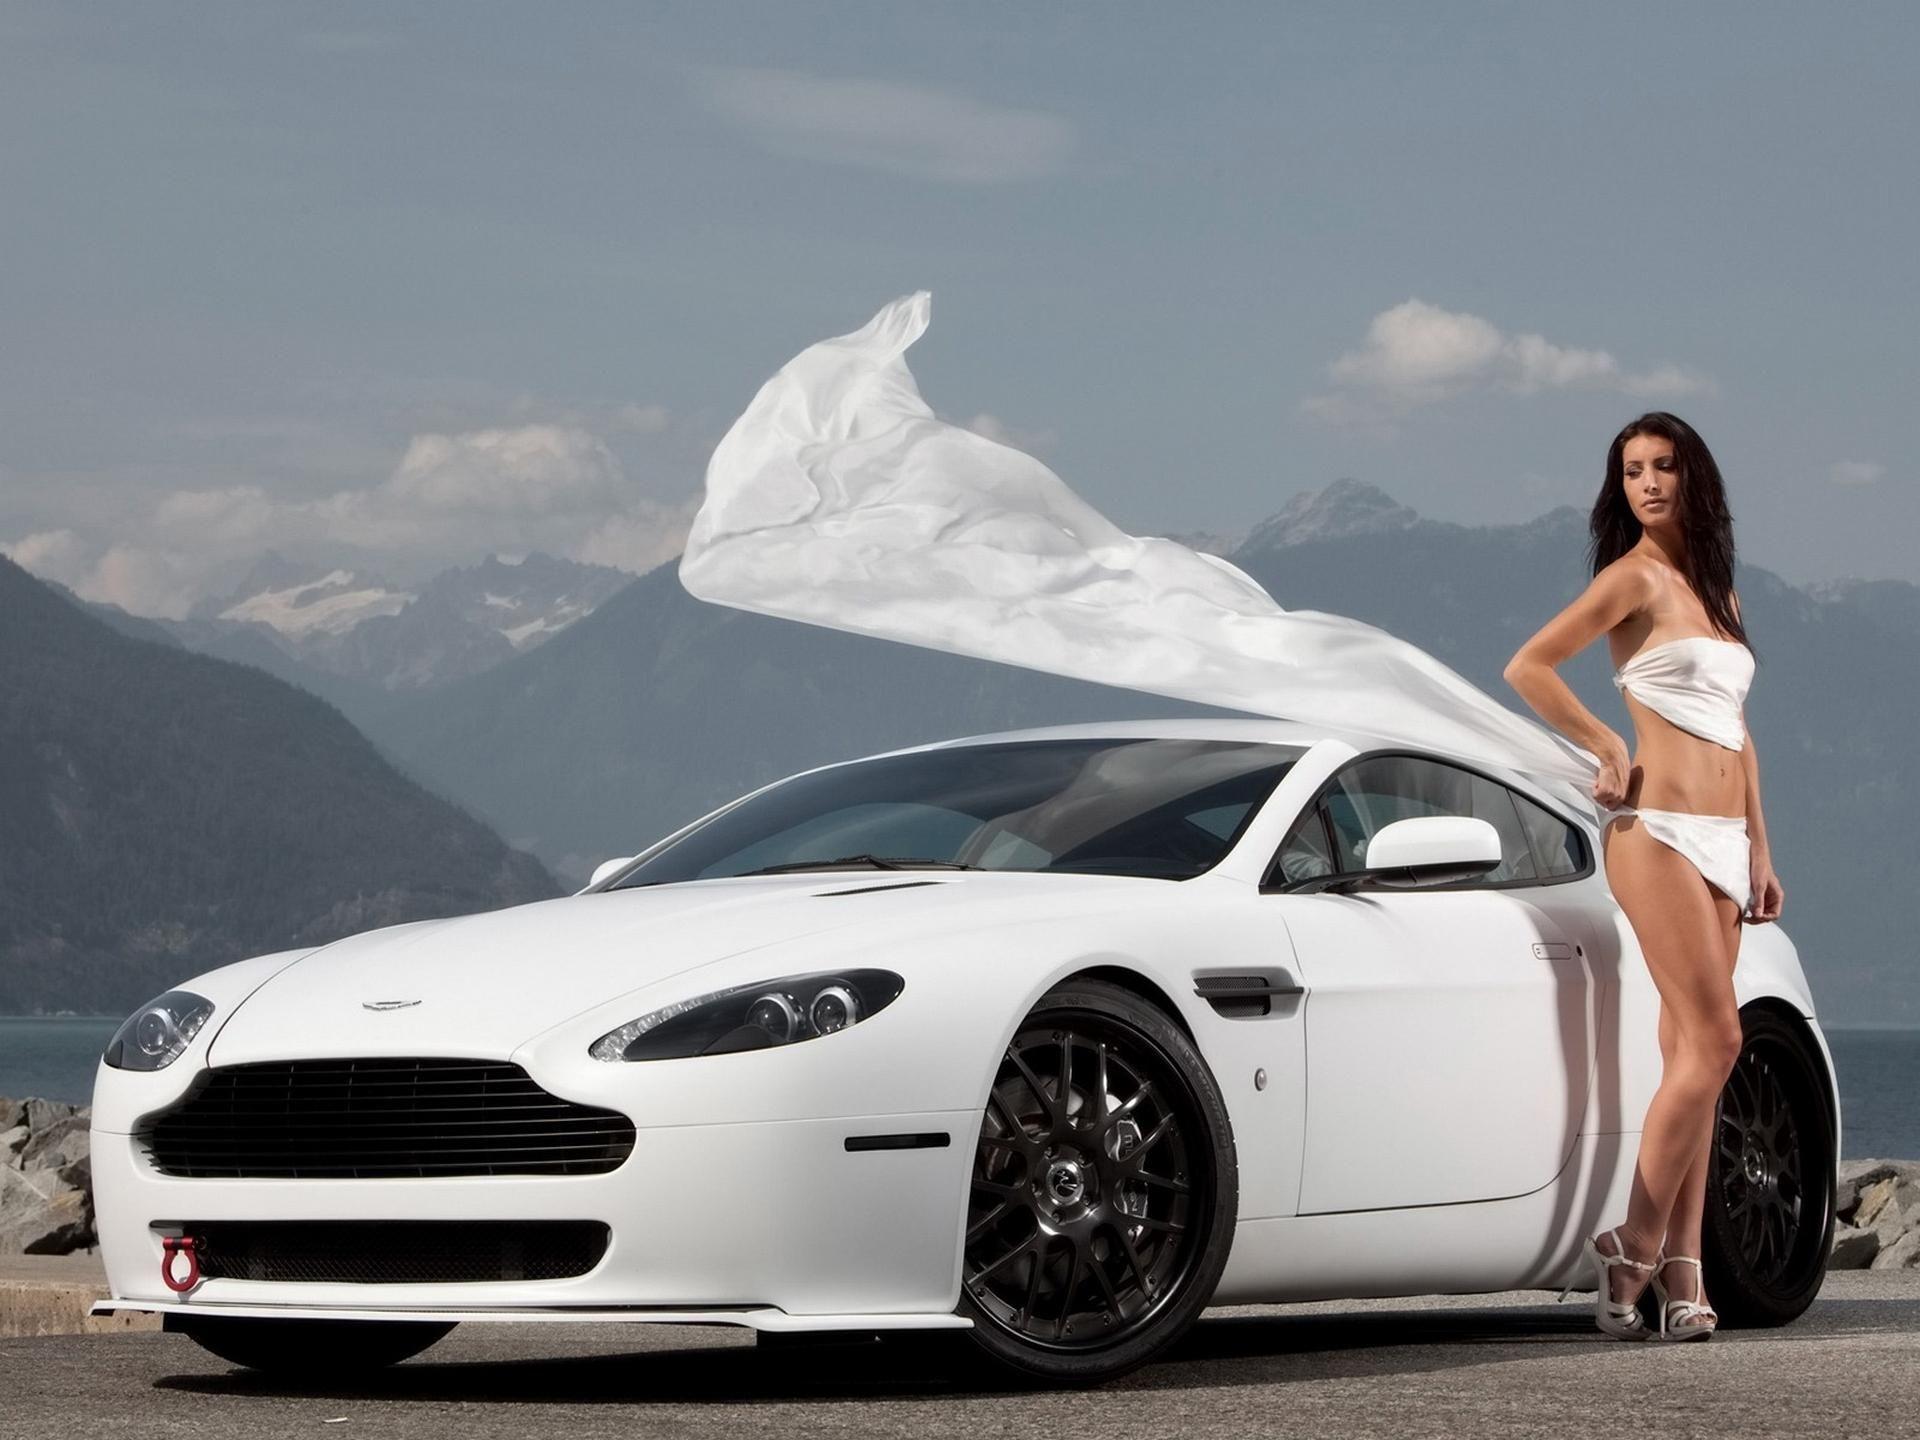 Aston Martin Vanquish Aston Martins Com Aston Martin Vanquish